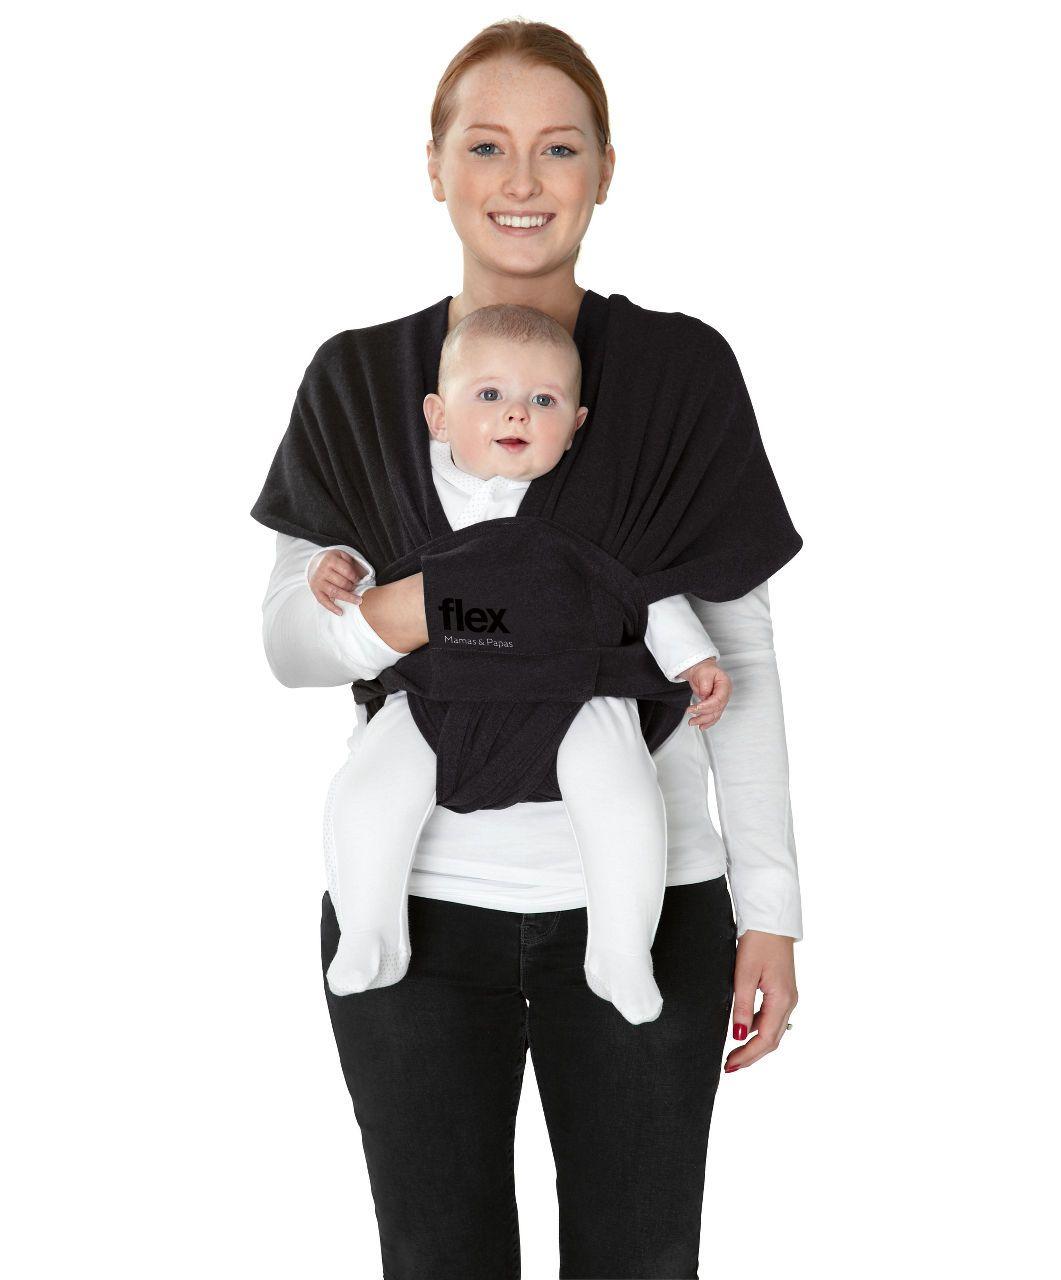 Flex Baby Sling S M Black Jack Slings Wraps Mamas Papas